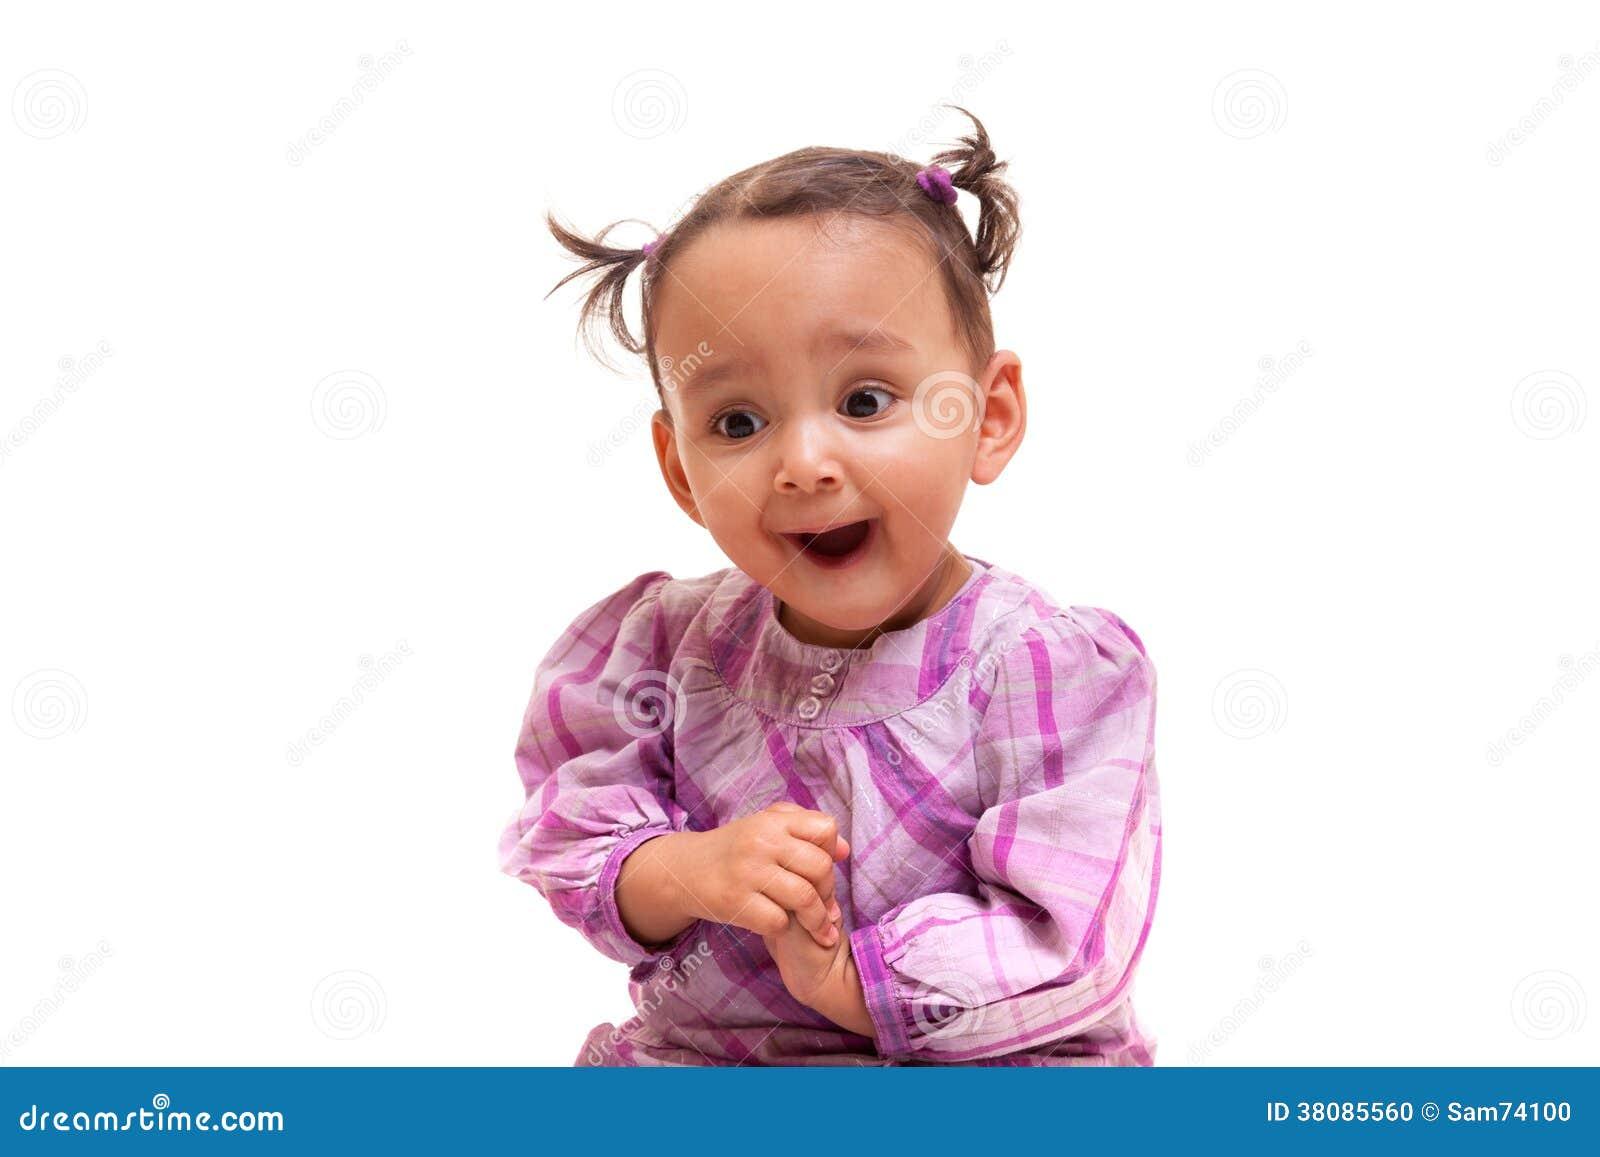 little african american babymeisje menina weinig afrikaanse leuke zwarte amerikaanse mensen som ragazza sveglie persone bambino afroamericane piccole colore della